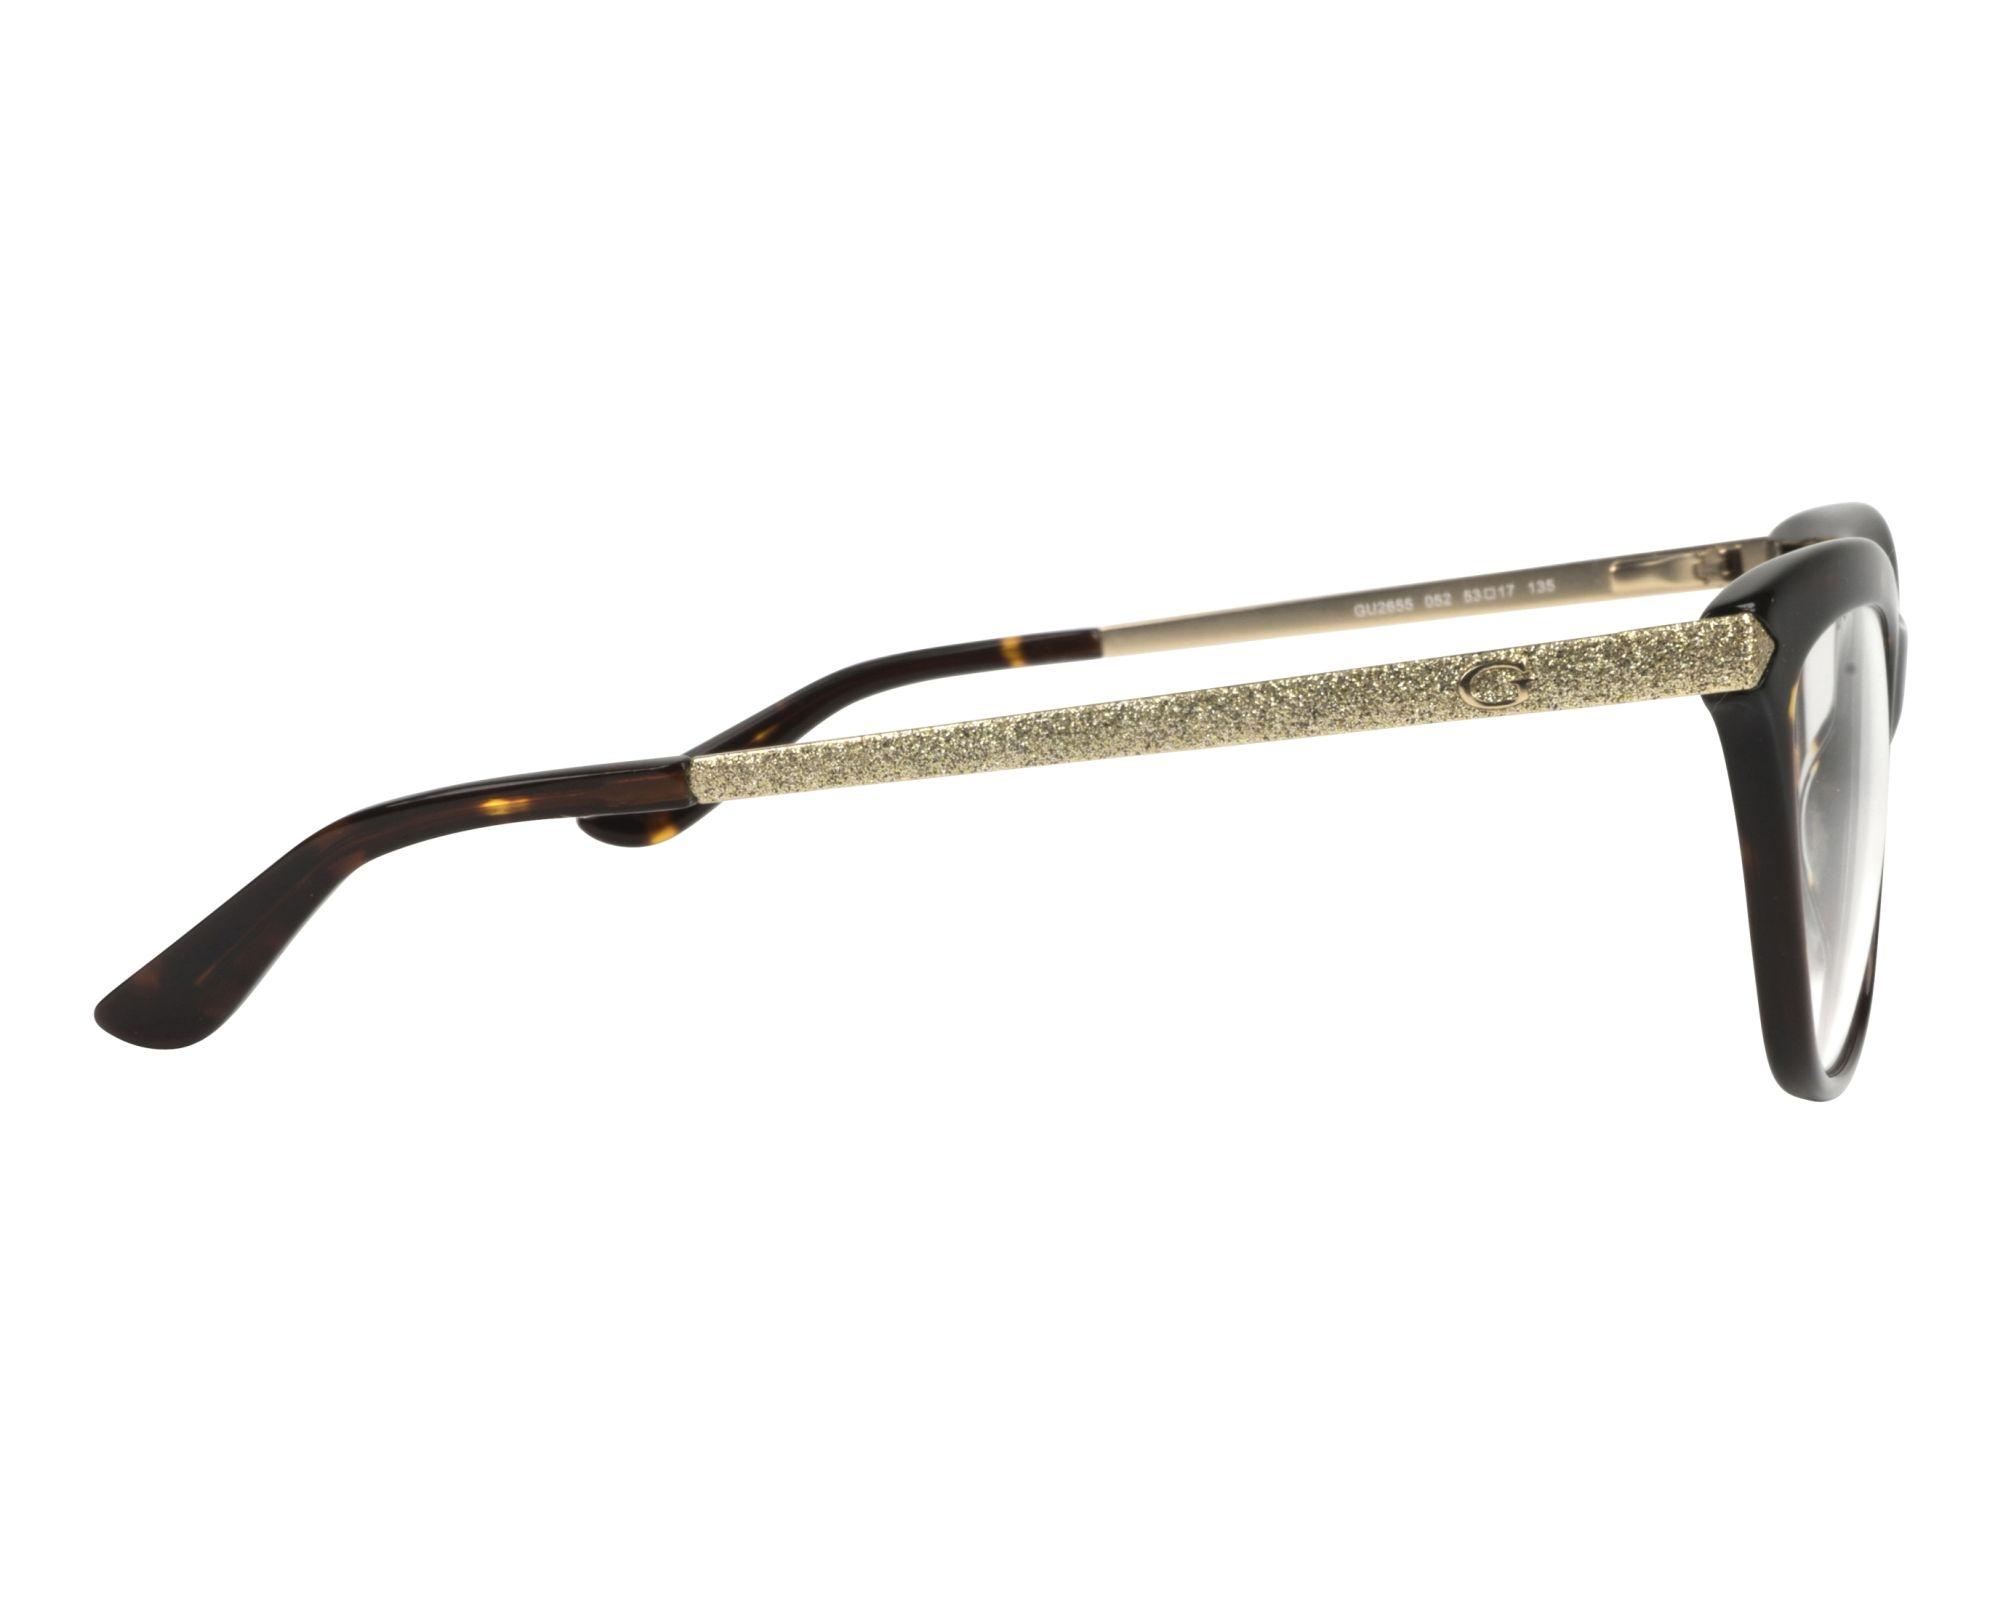 a92b699e357 eyeglasses Guess GU-2655 052 53-17 Havana Gold side view